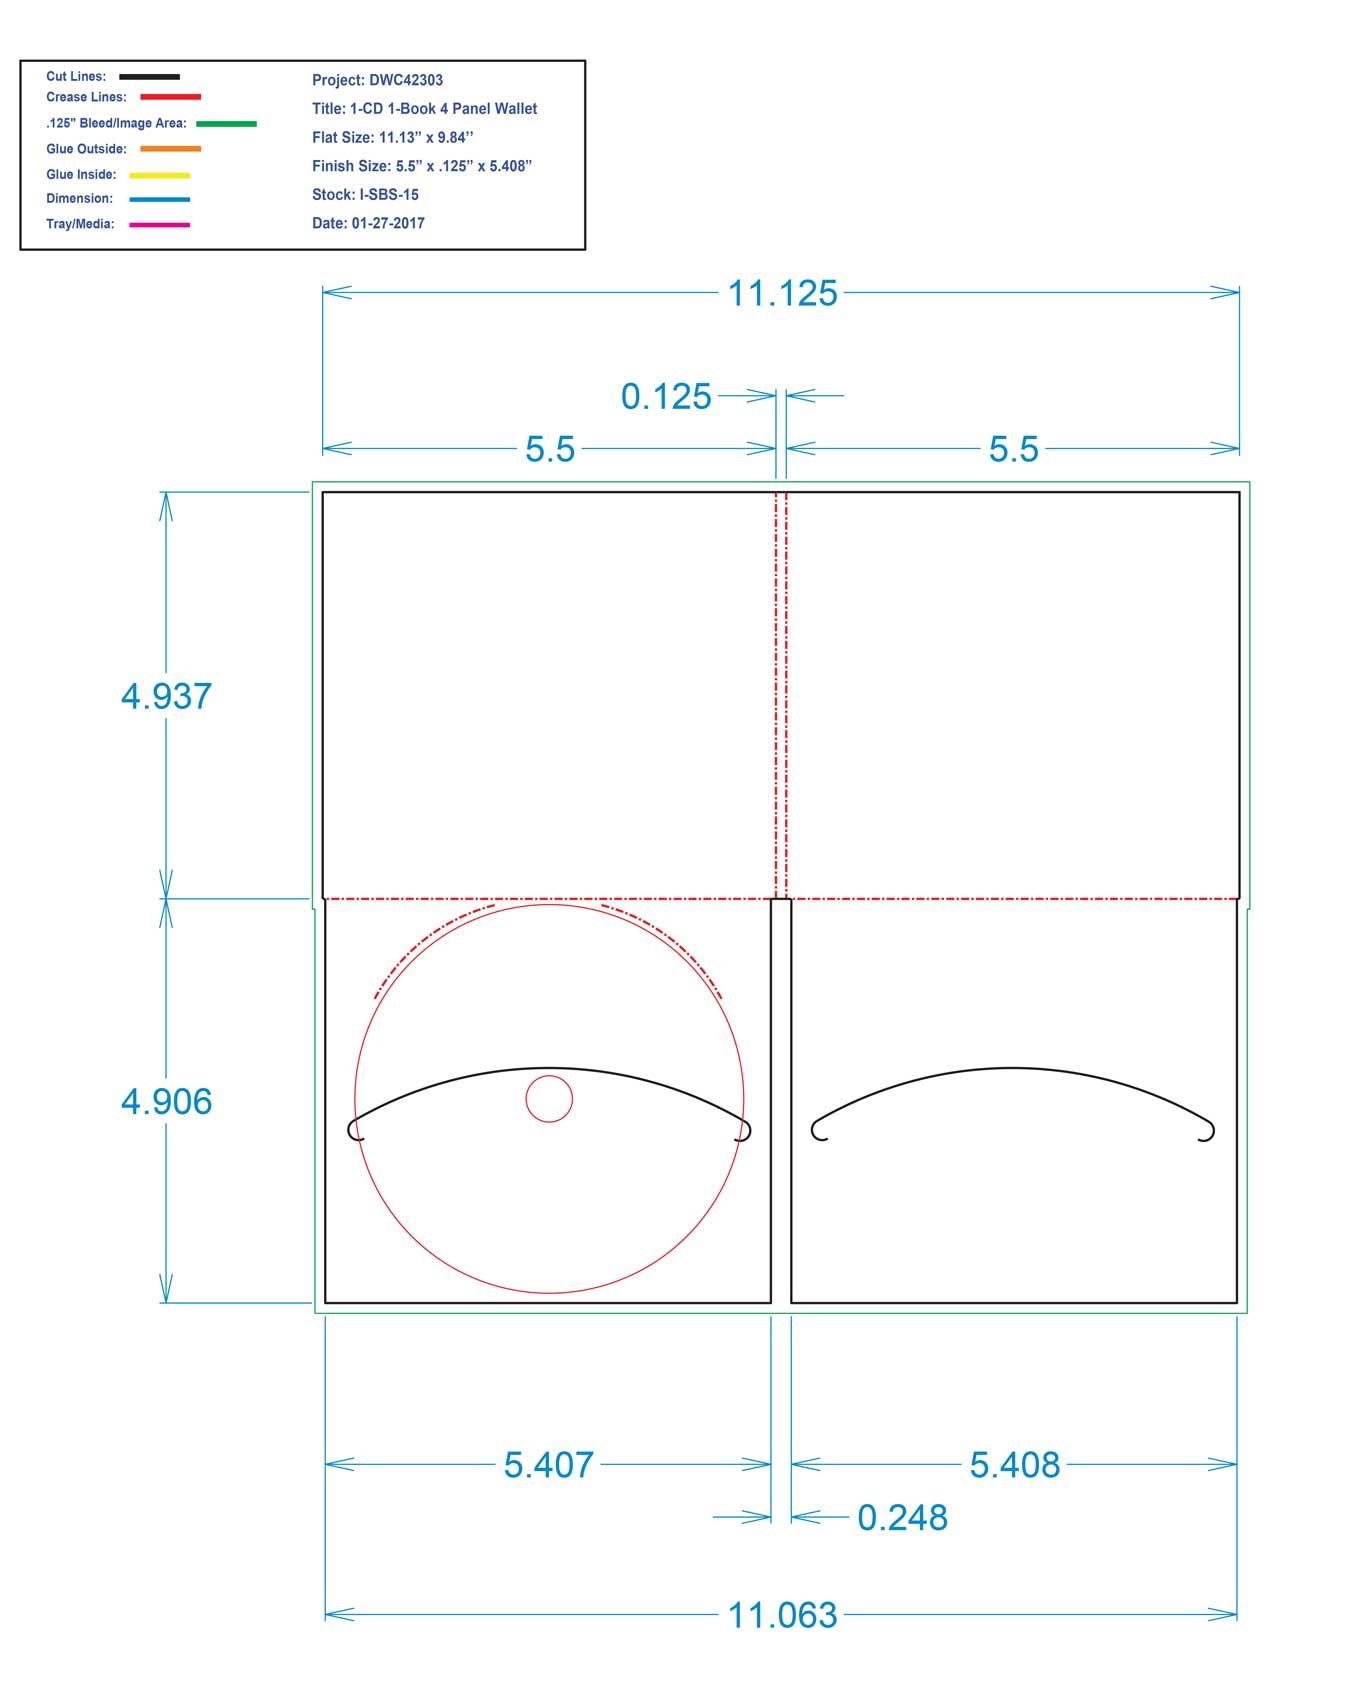 DWC42303-1-CD 1-Book 4 Panel Wallet